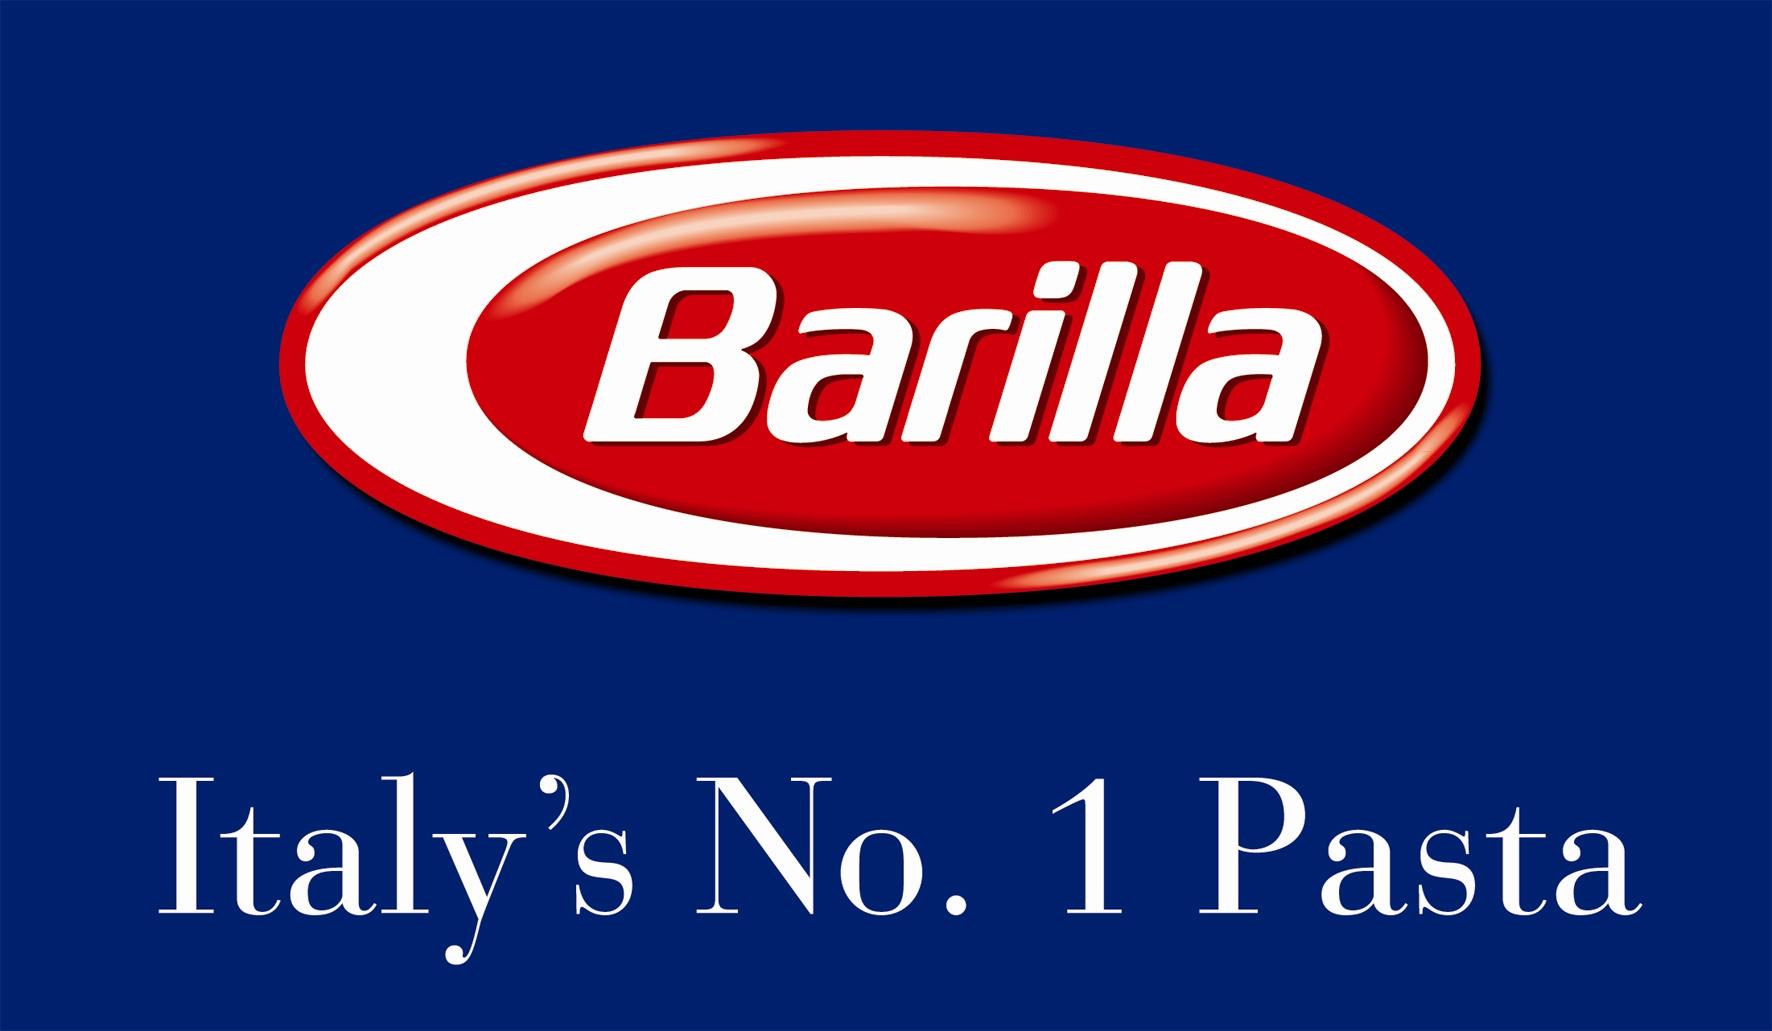 Barilla1